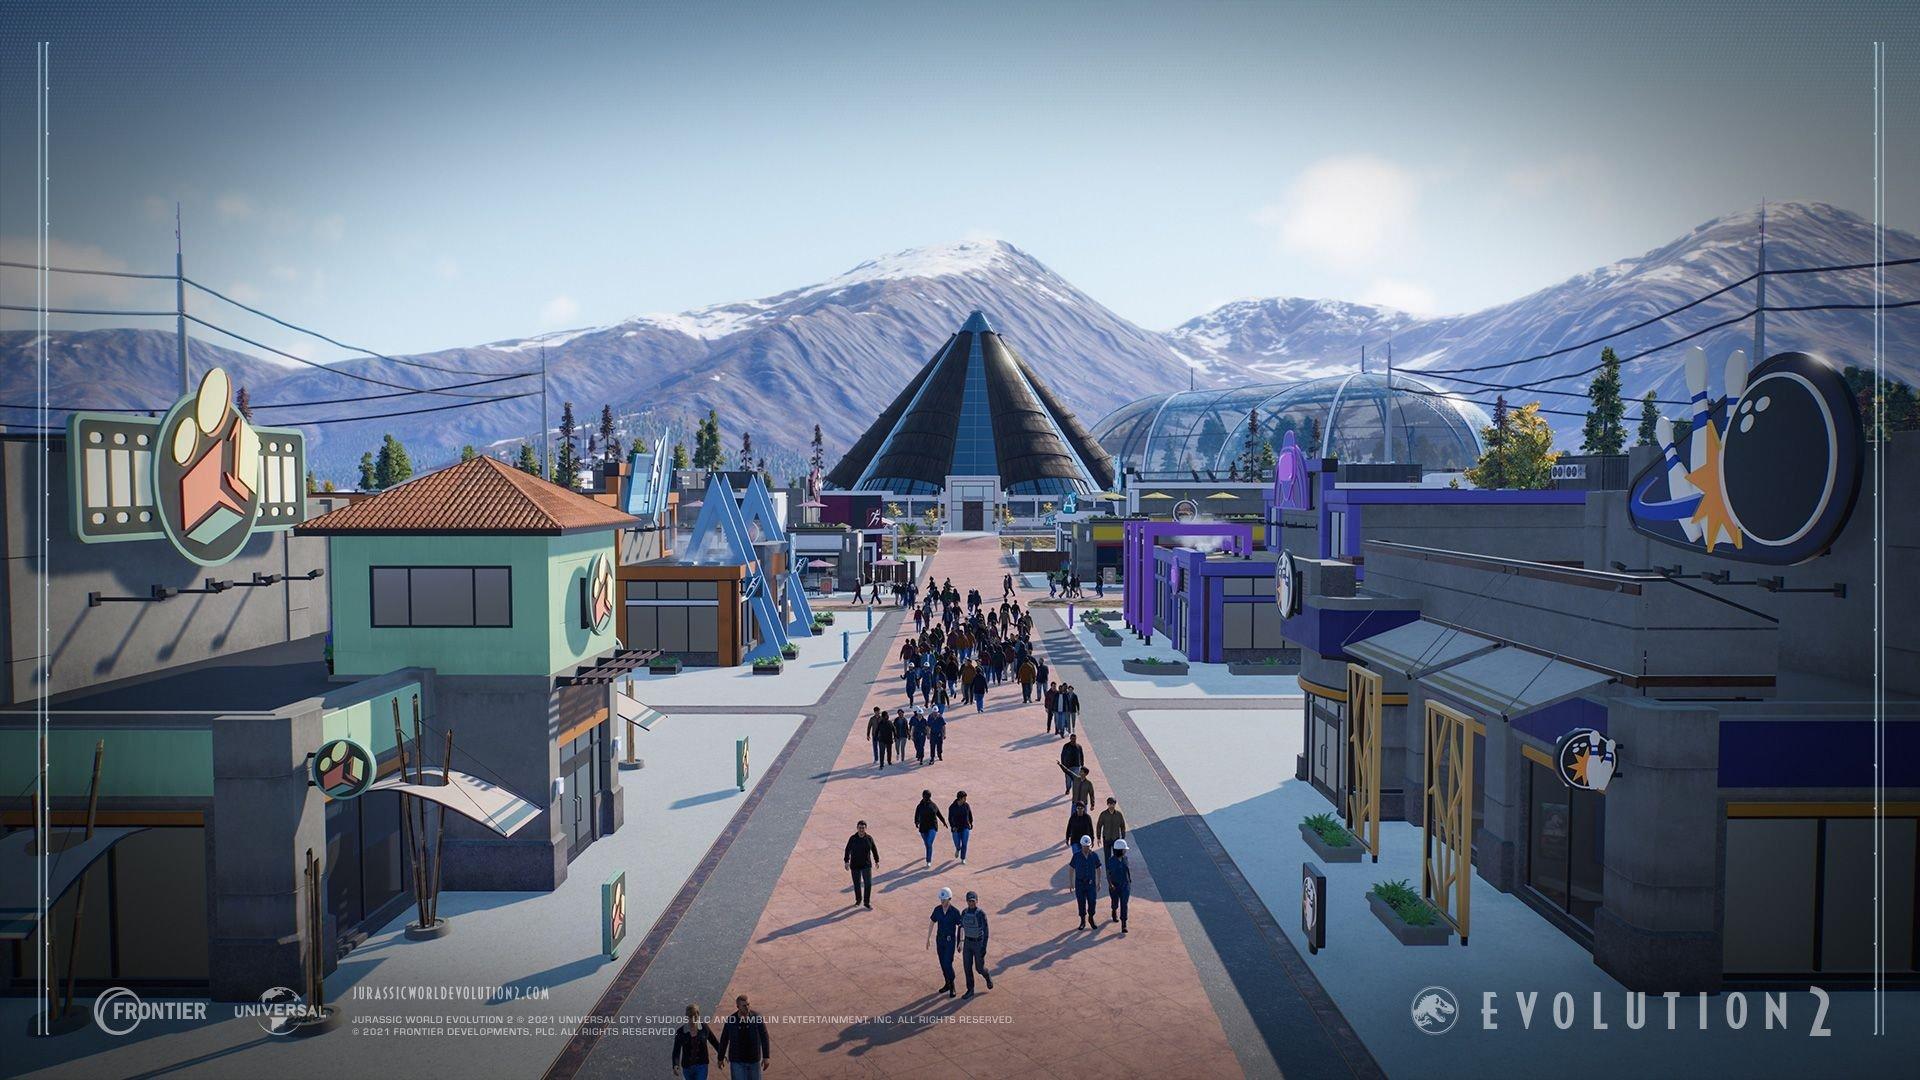 Jurassic-World-Evolution-2-Screenshot-Announcement-Summer-Game-Fest-2021-4